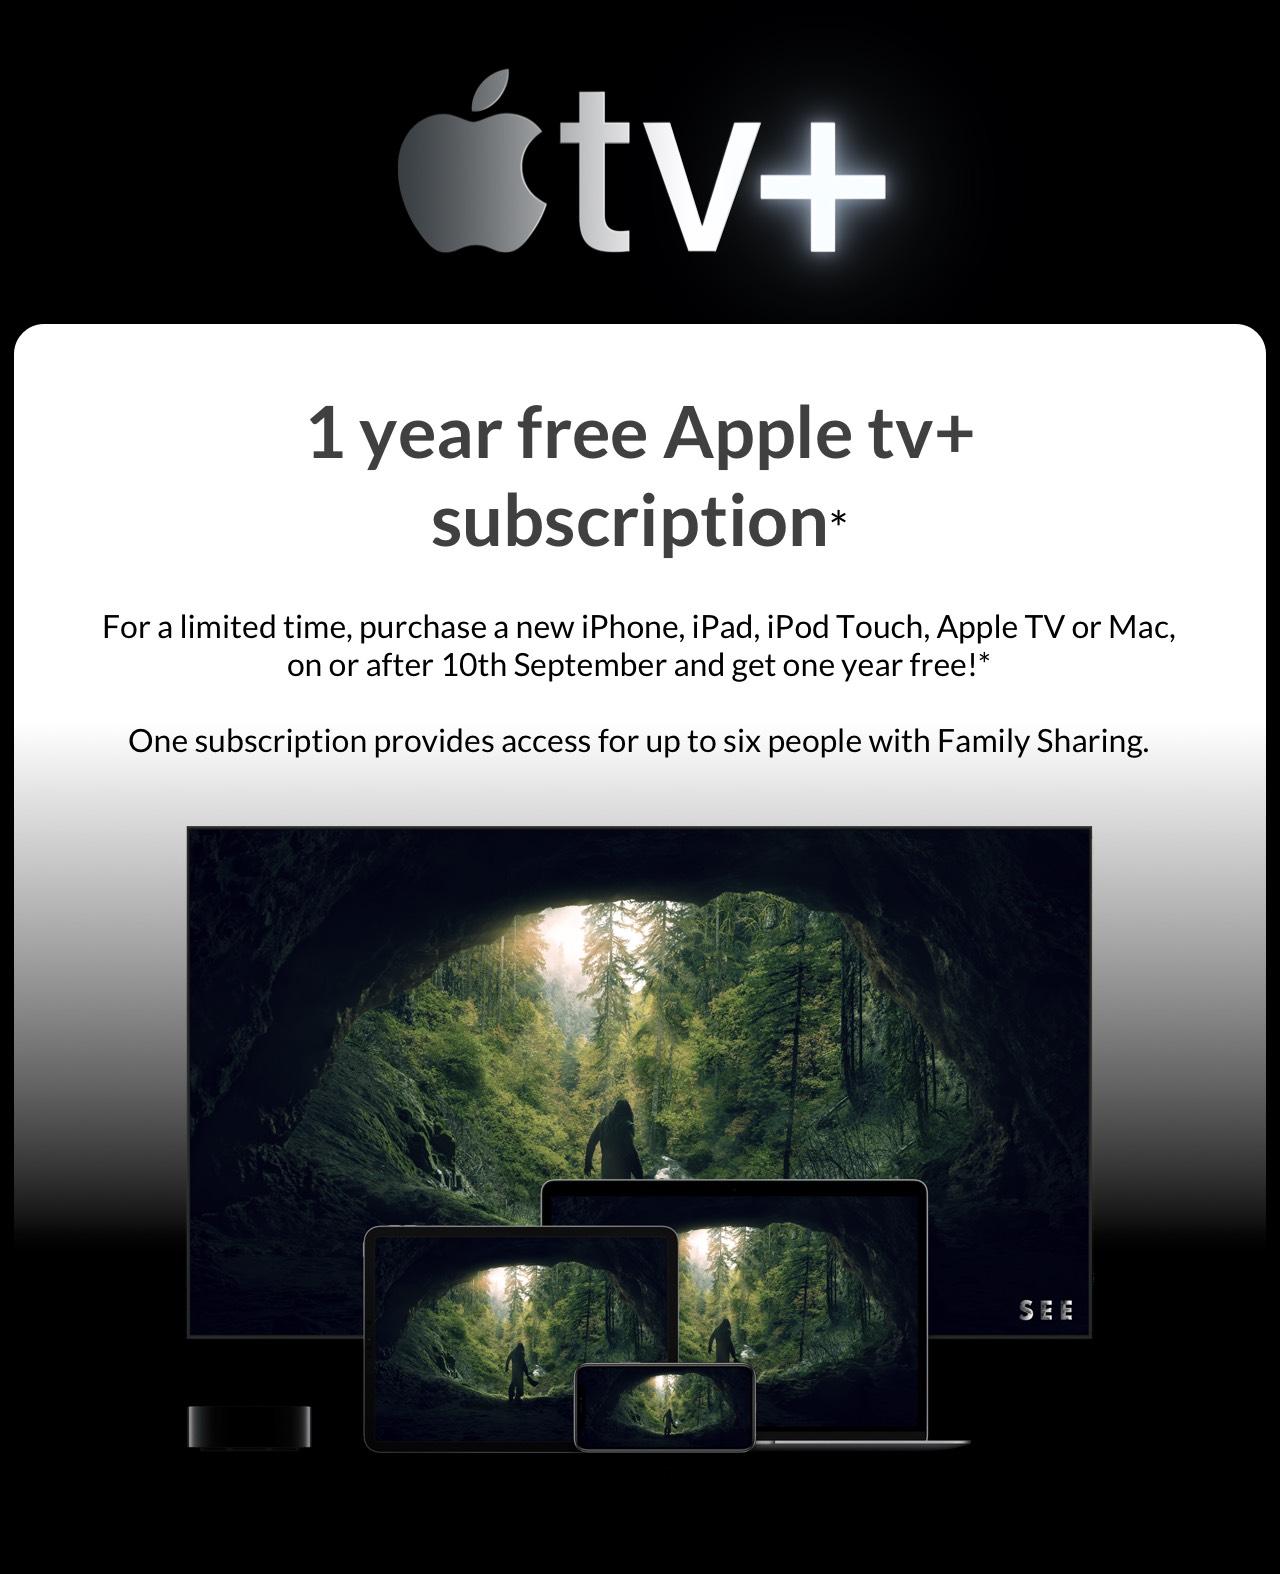  1 year free Apple TV+ *